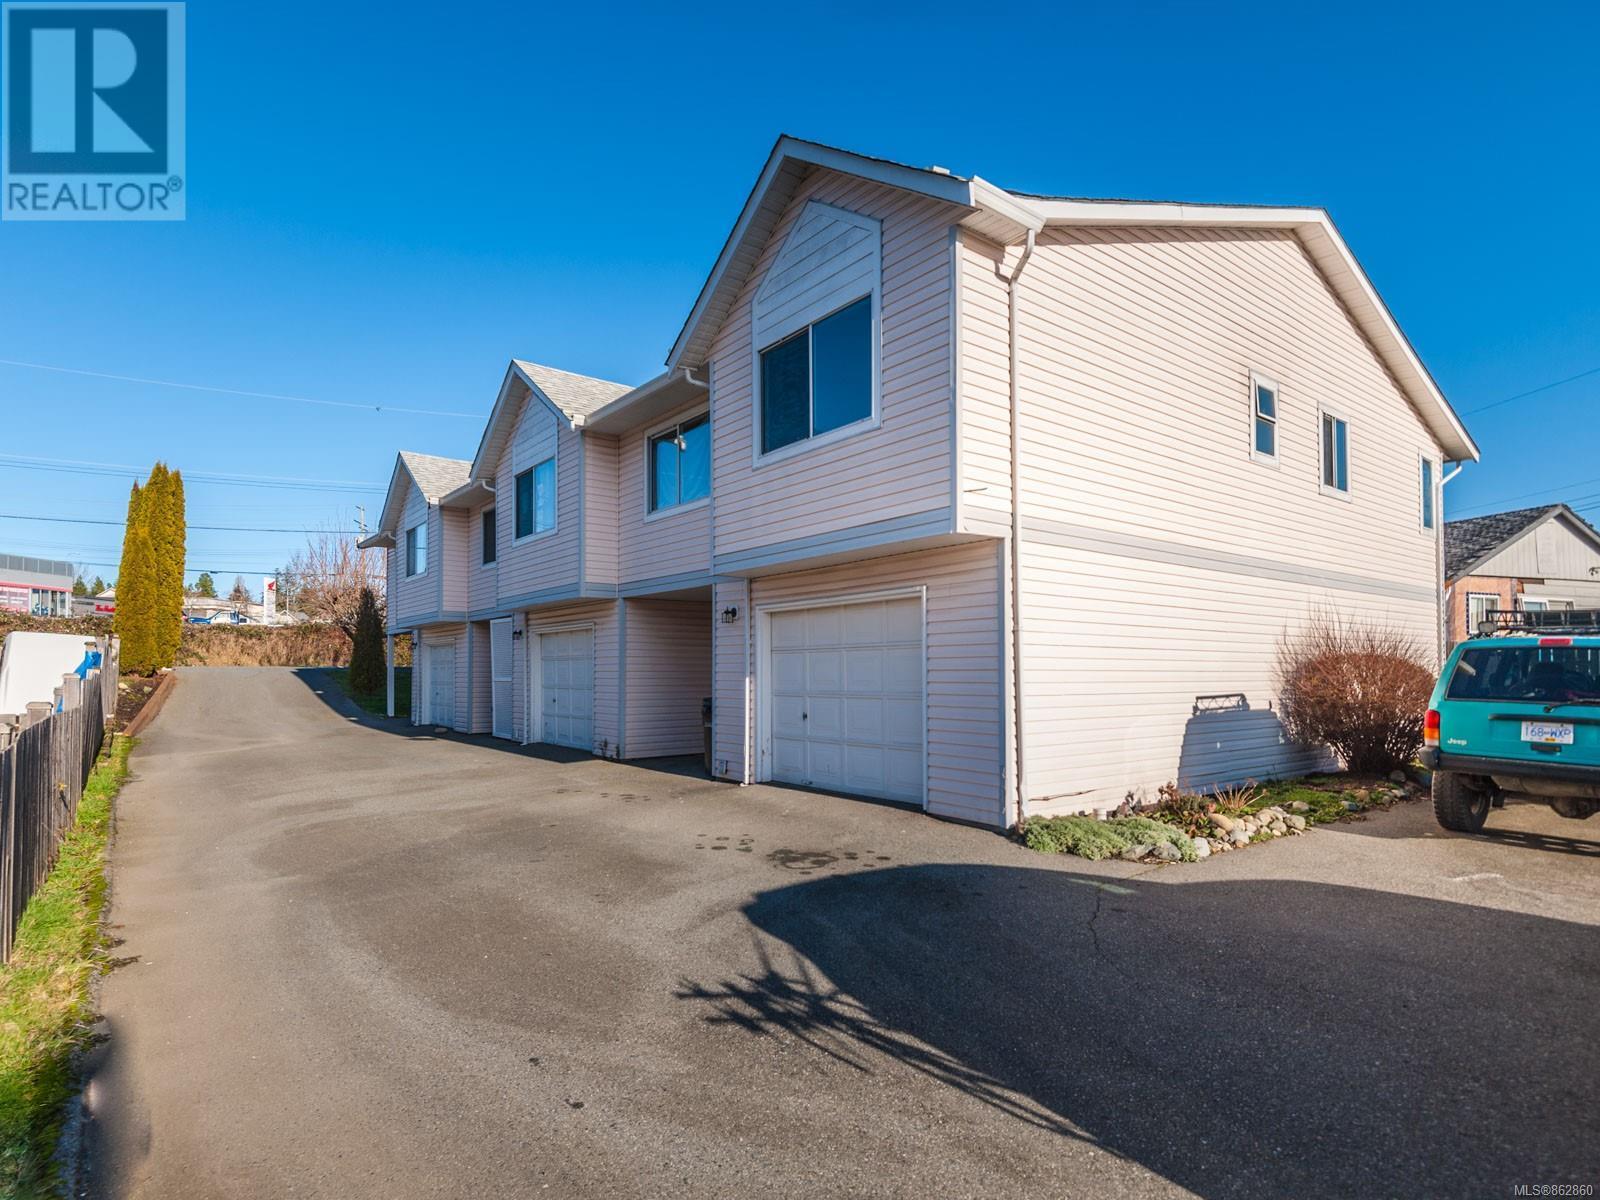 2 1705 Kerrisdale Rd, Nanaimo, British Columbia  V9S 1N4 - Photo 2 - 862860